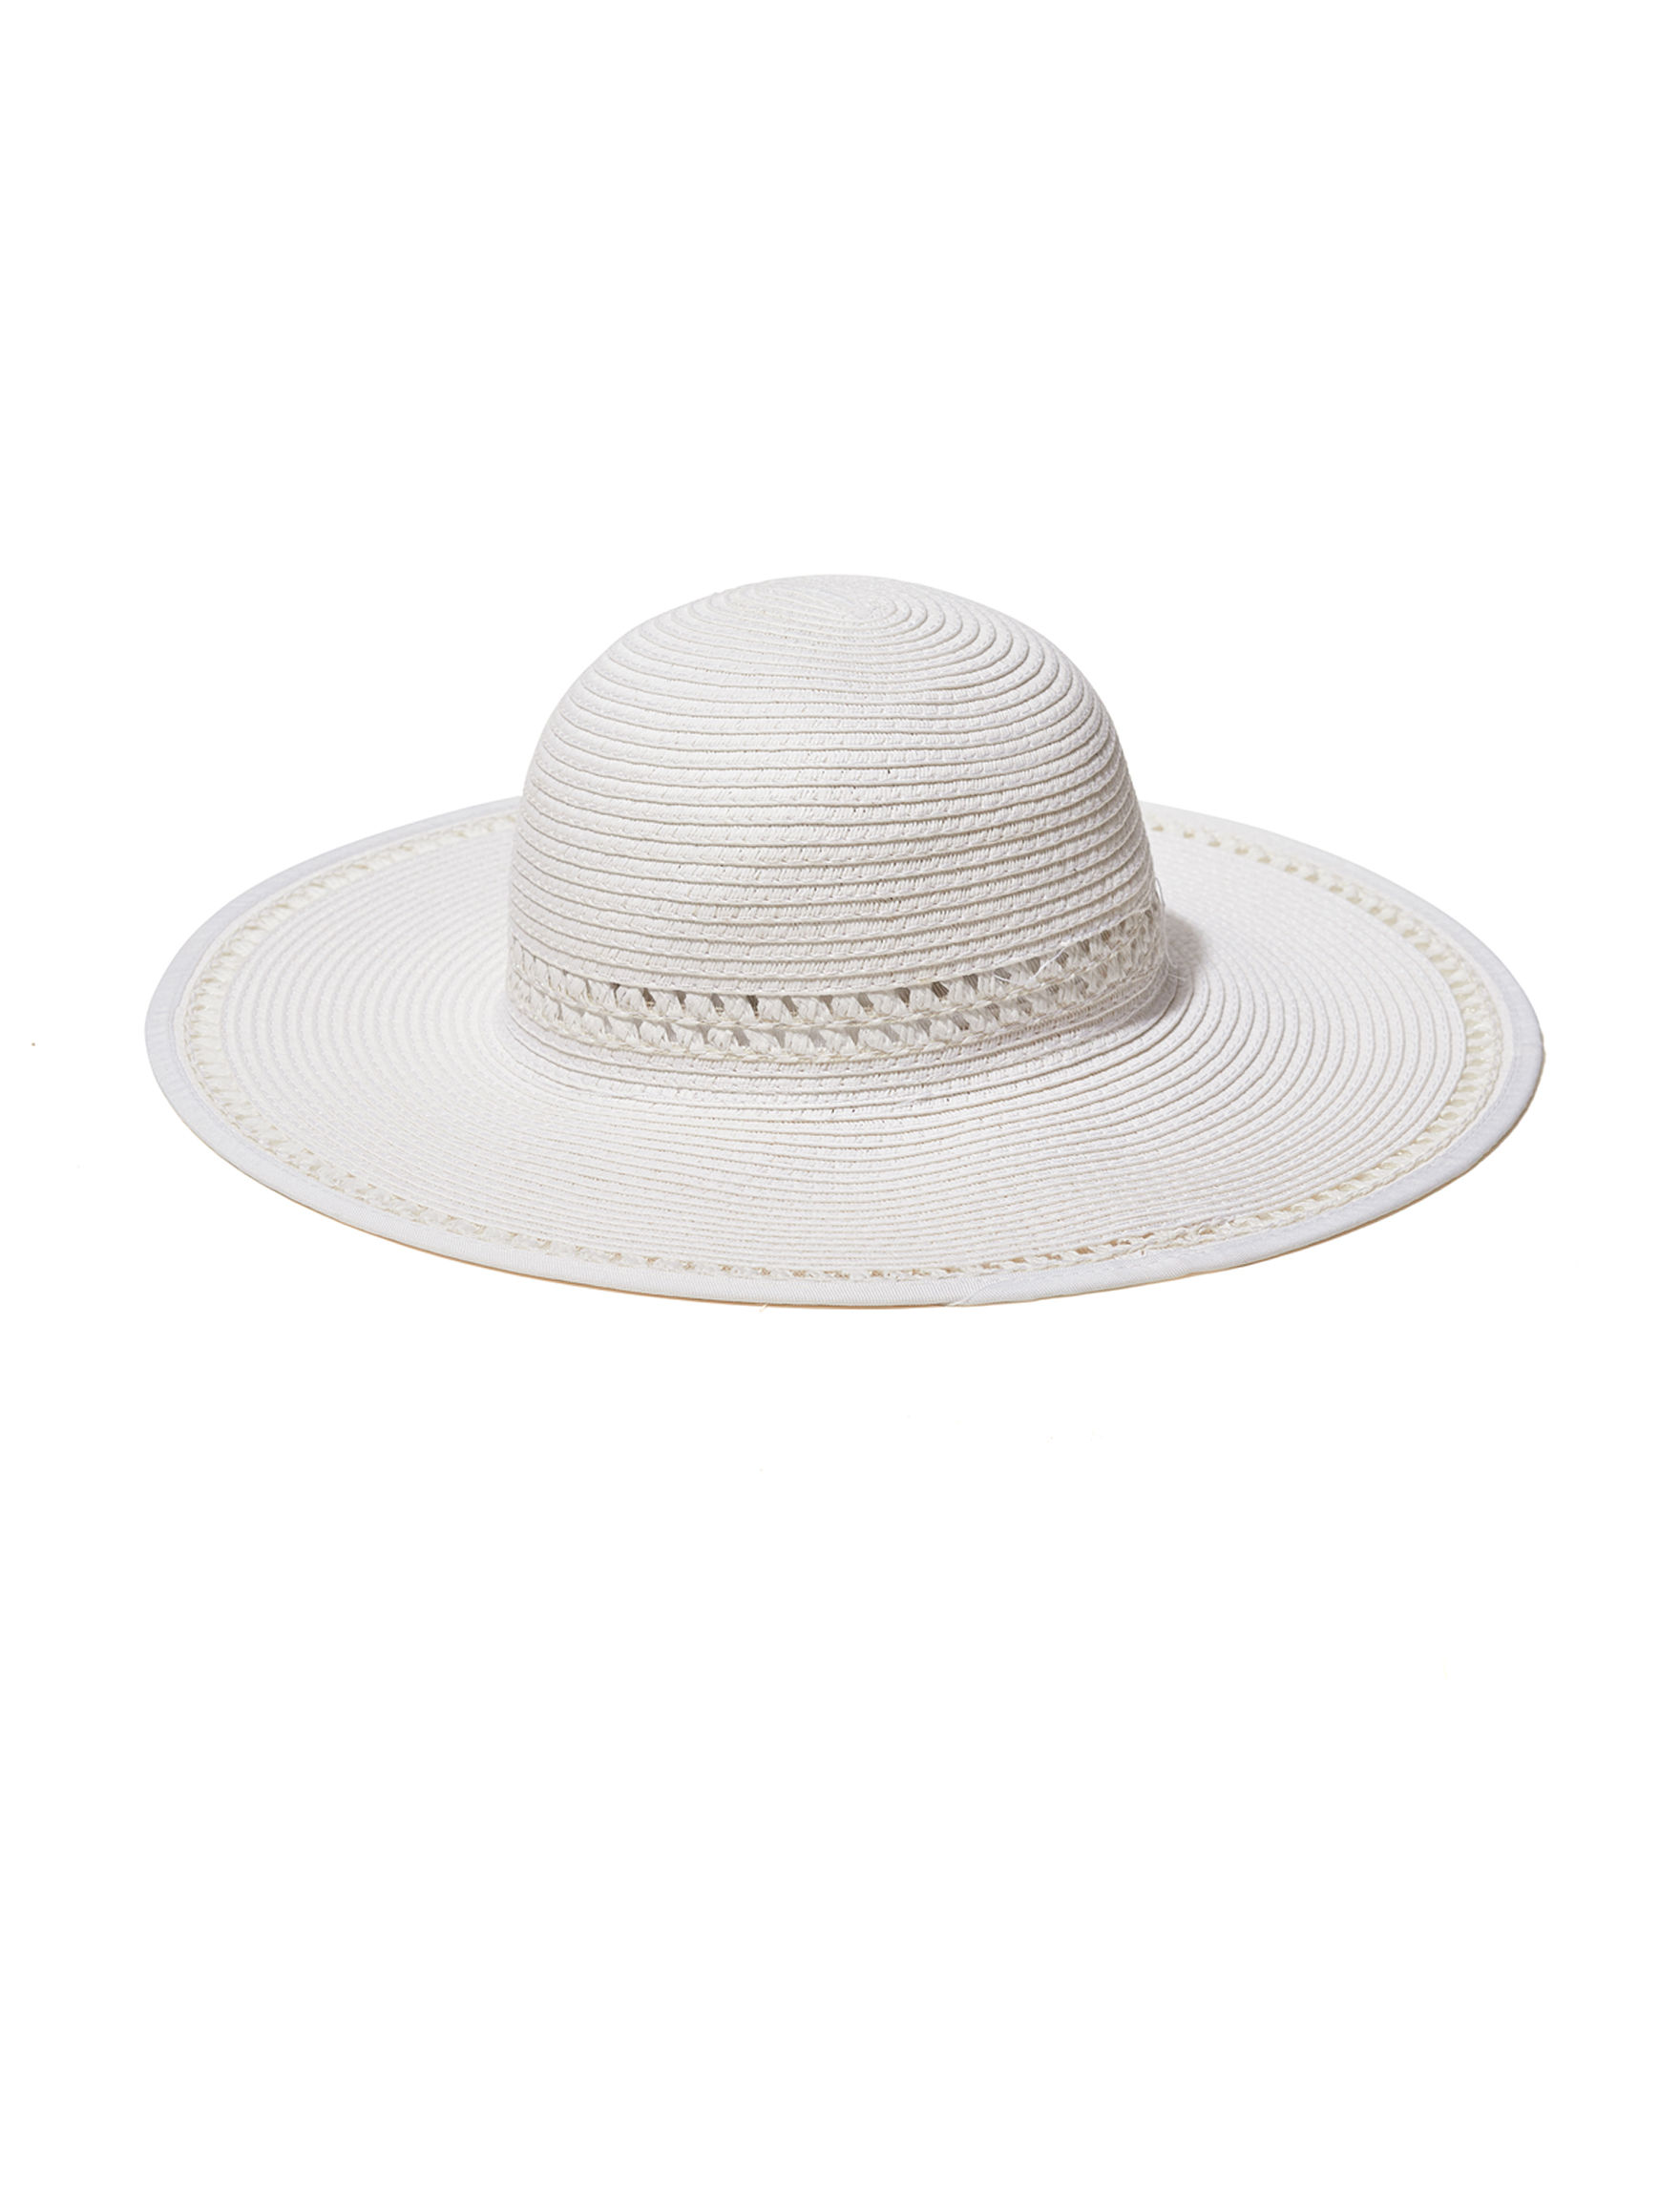 David & Young White Hats & Headwear